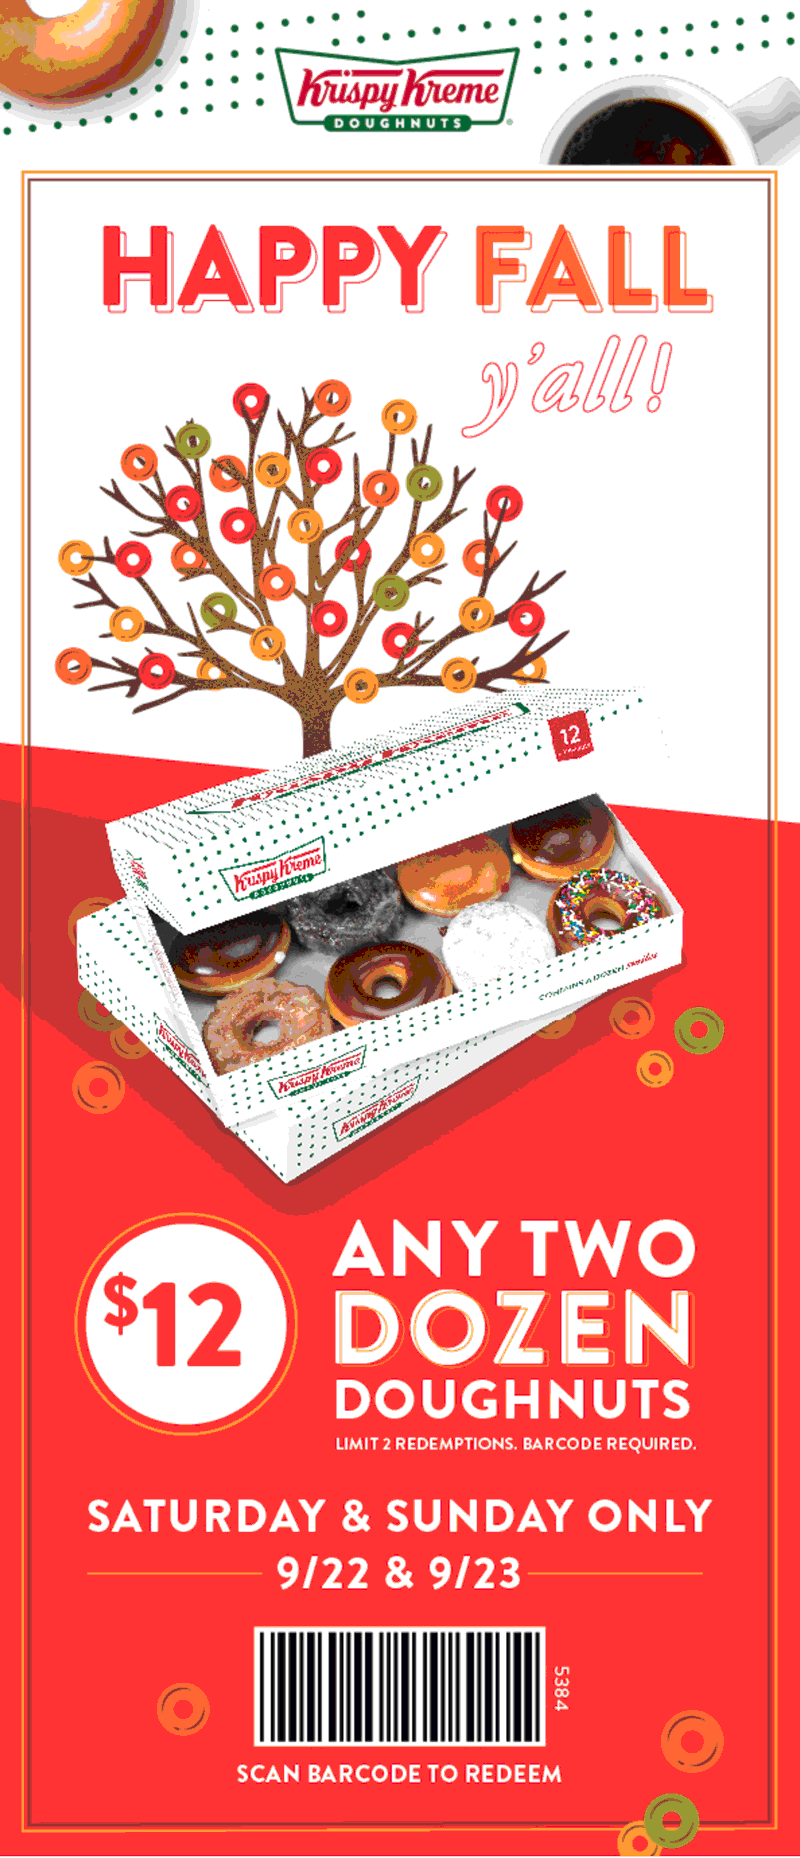 Krispy Kreme Coupon May 2020 2 dozen doughnuts for $12 at Krispy Kreme